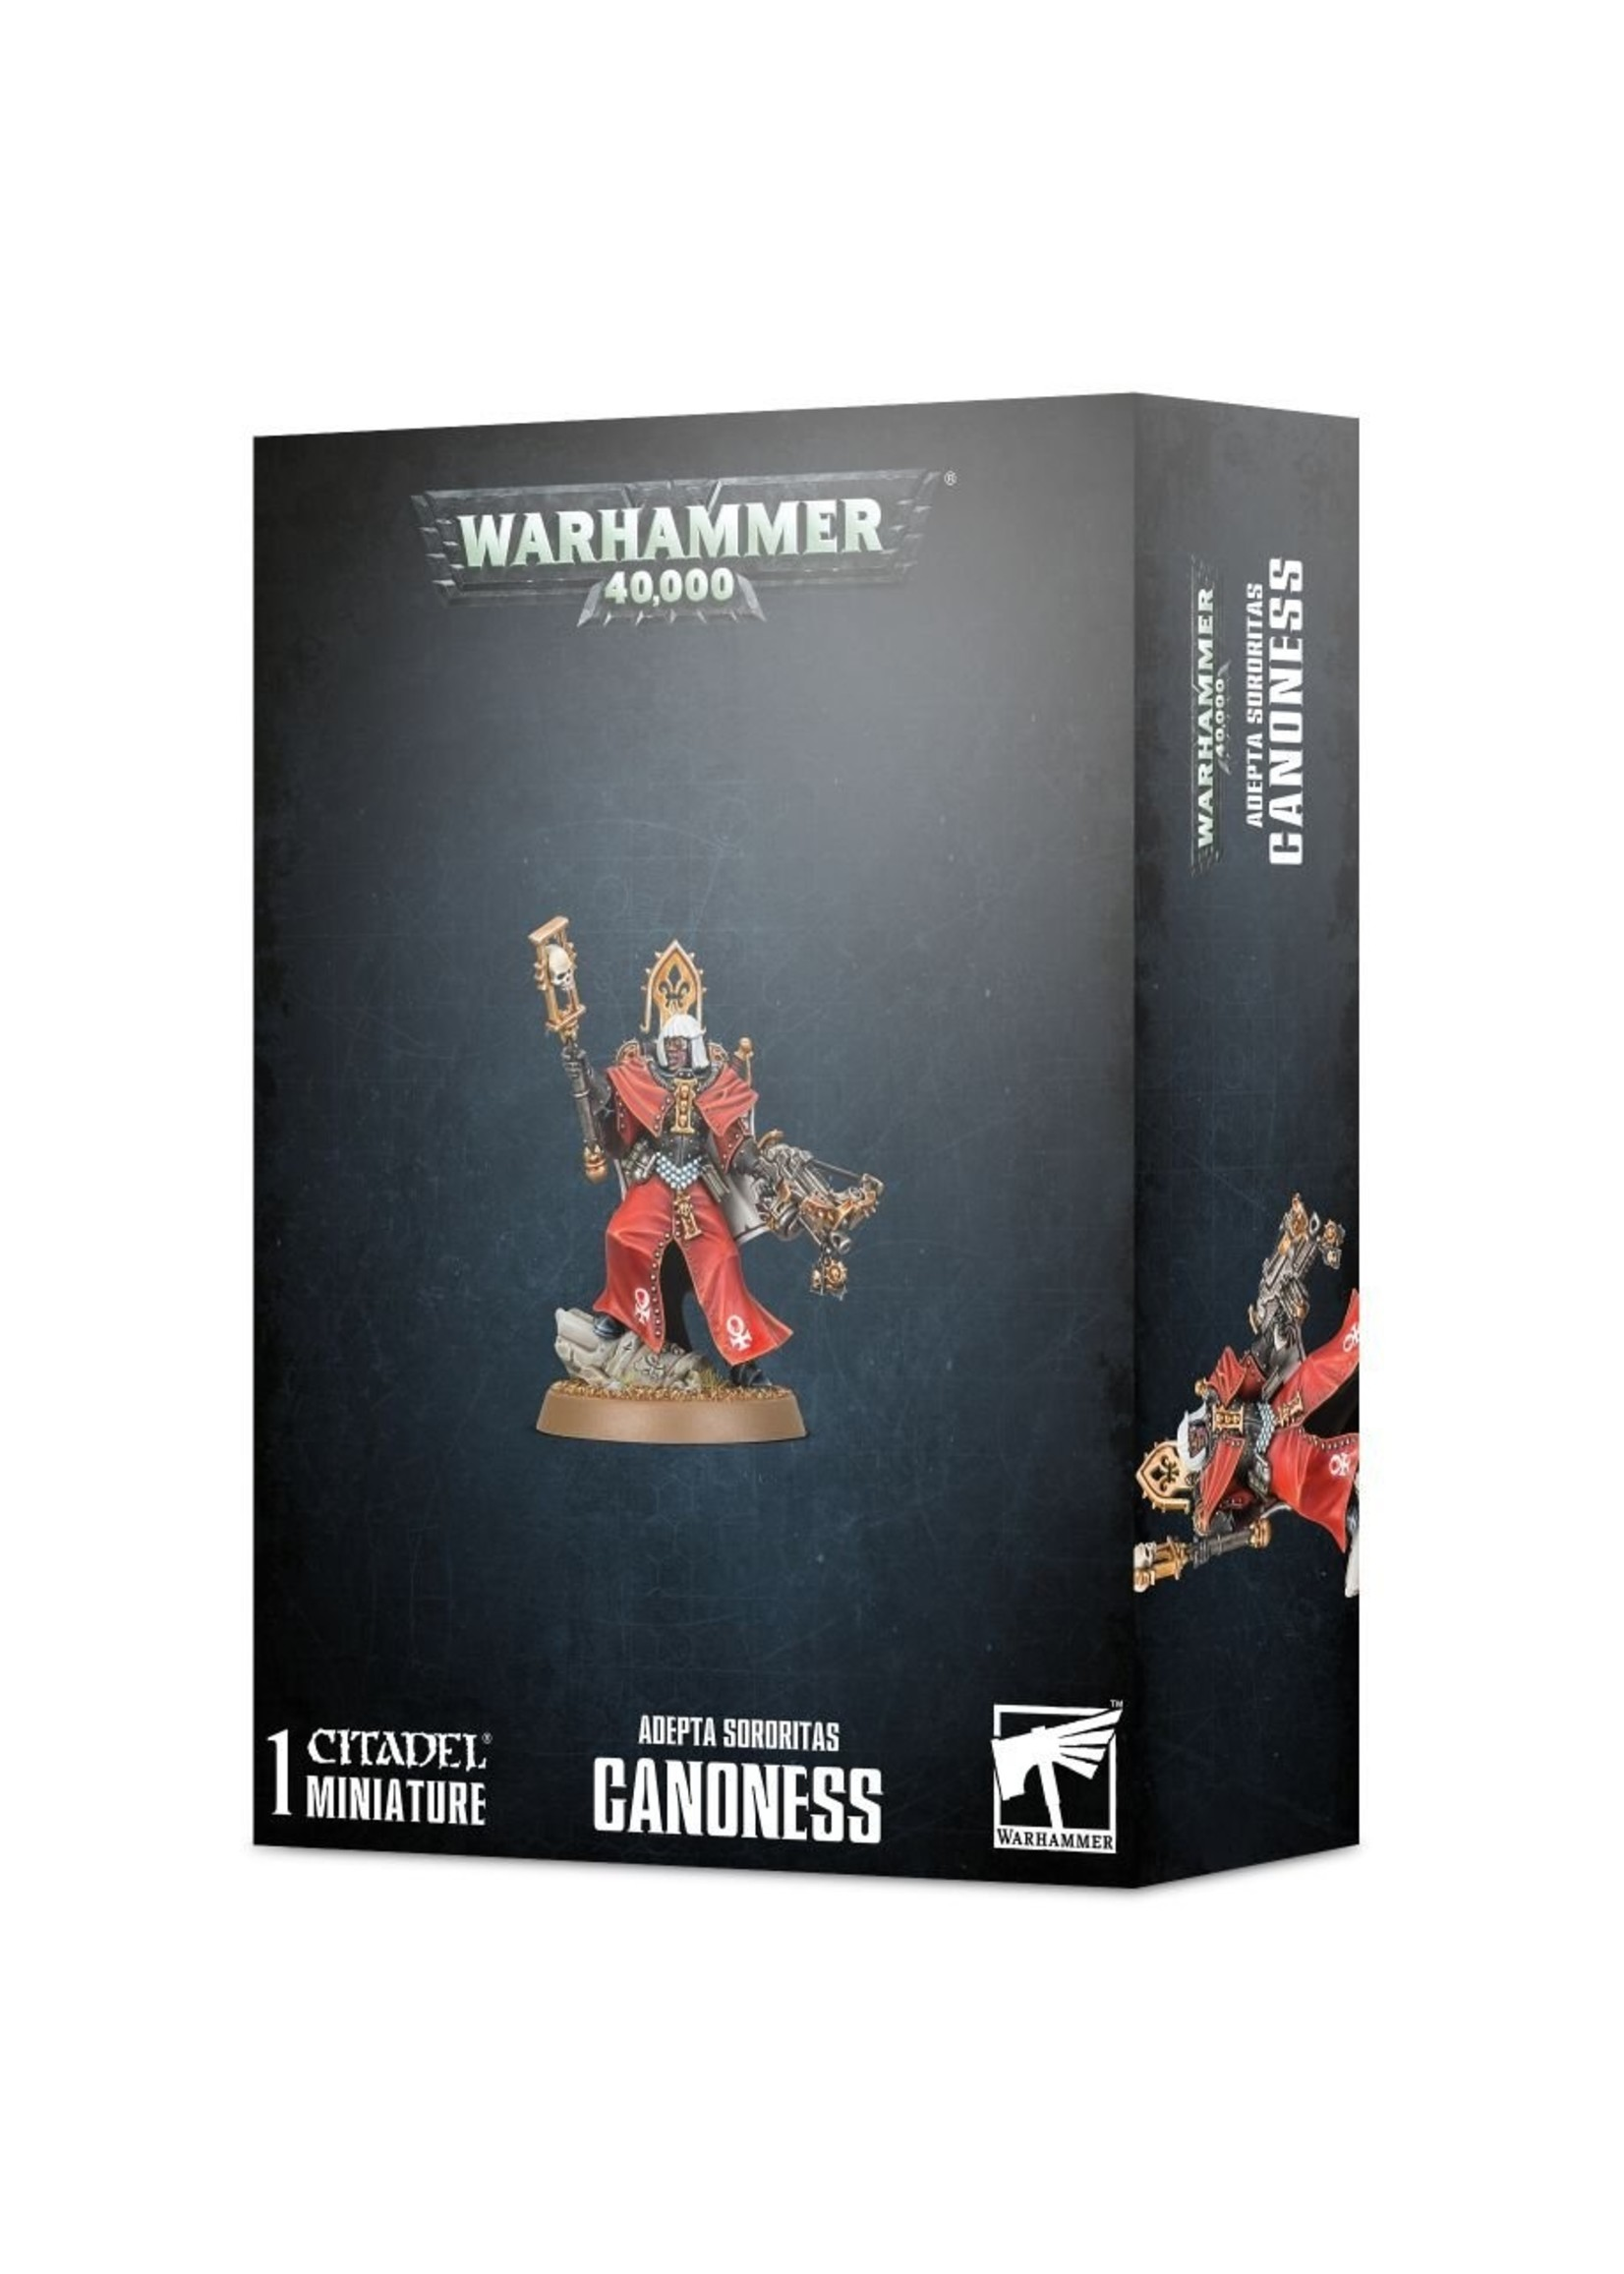 Warhammer 40K: Adepta Sororitas - Canoness